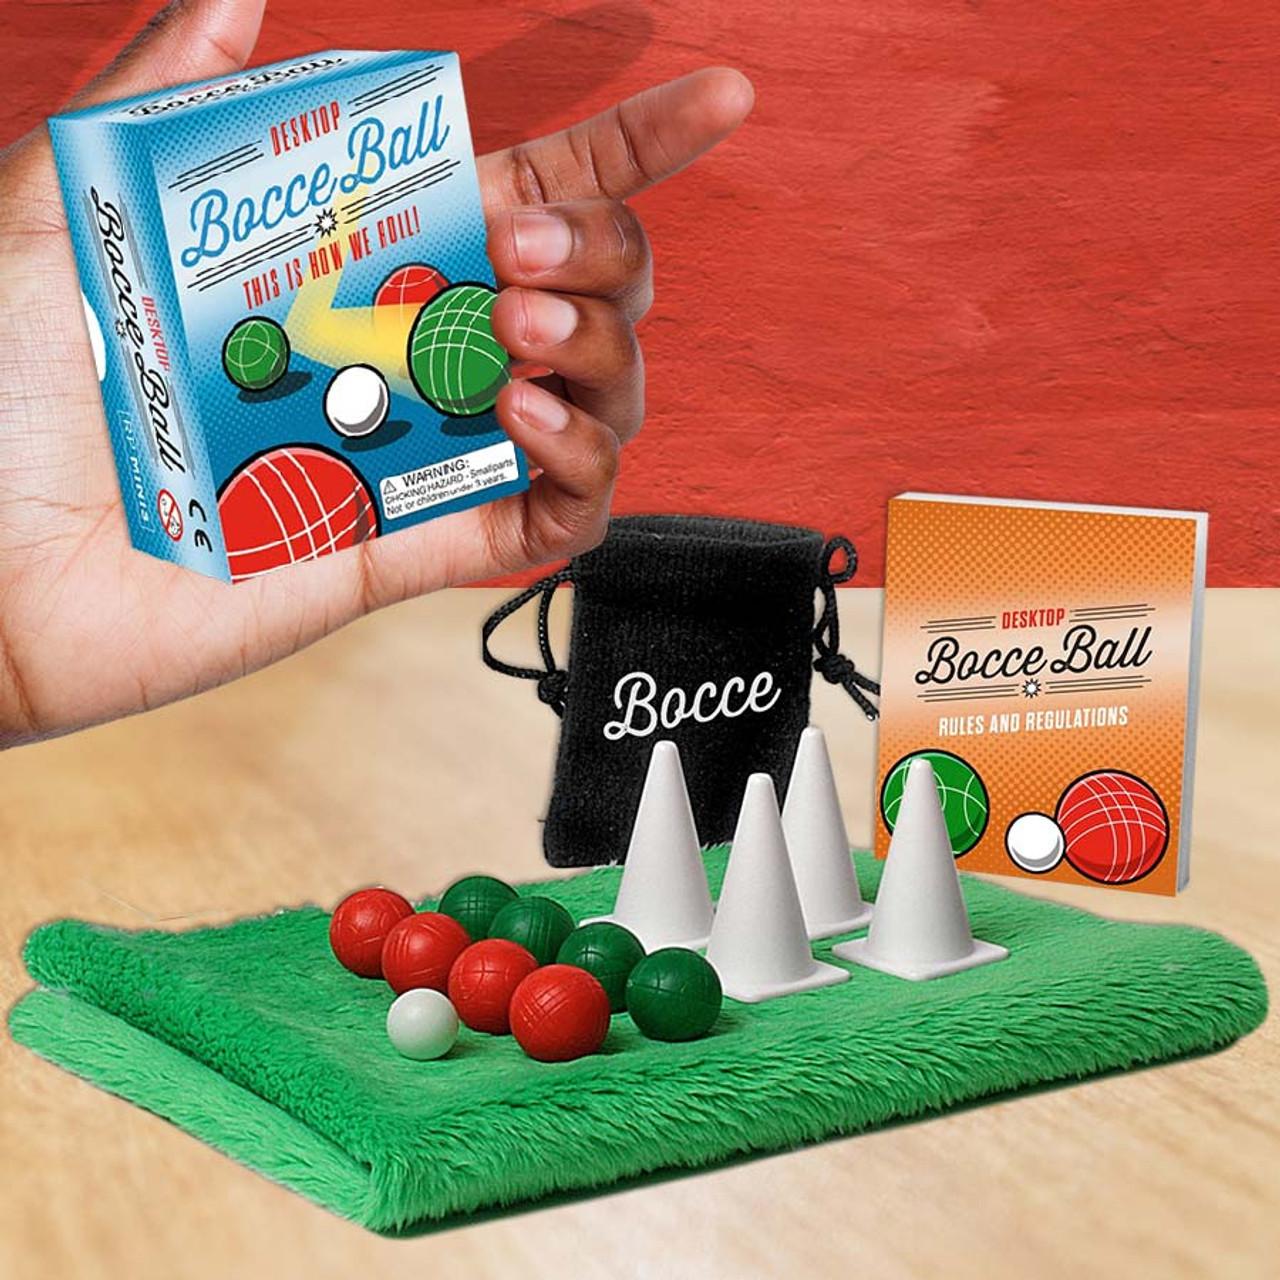 Mini Office Toy Desktop Bocce Ball